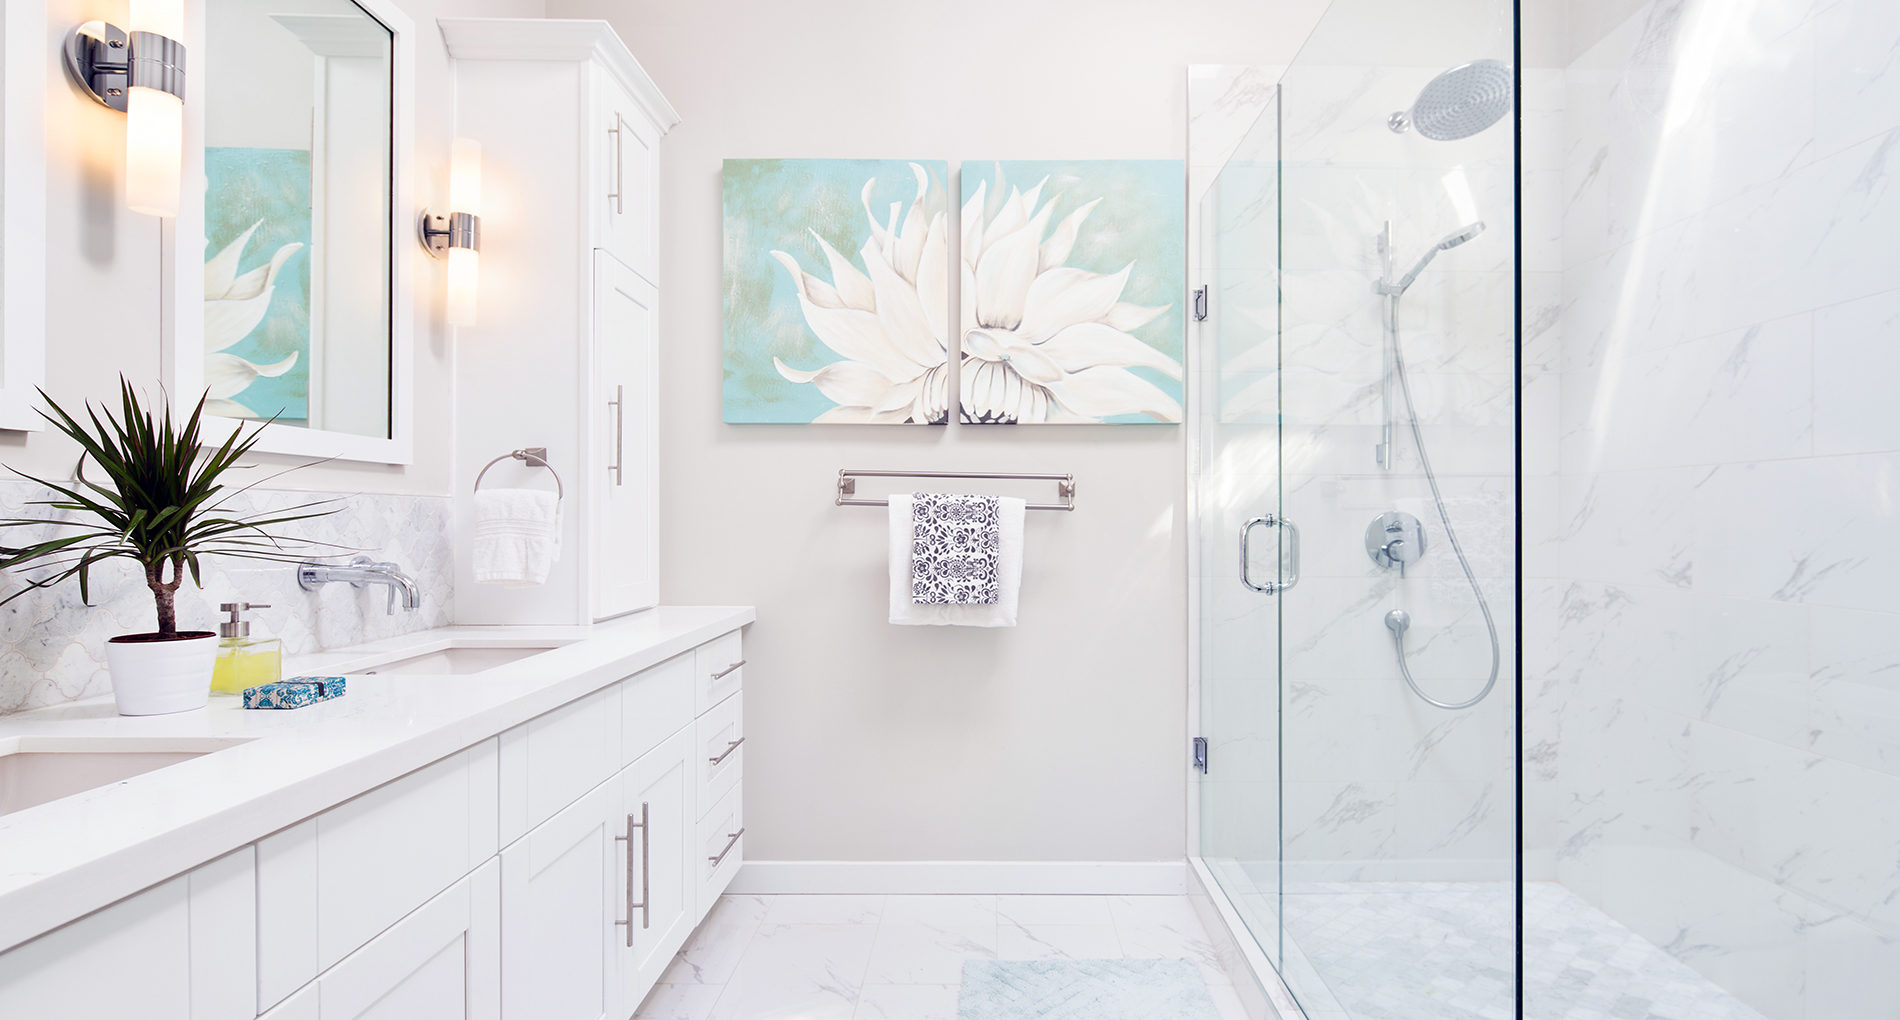 Bathroom Renovation Kelowna West17th Slider